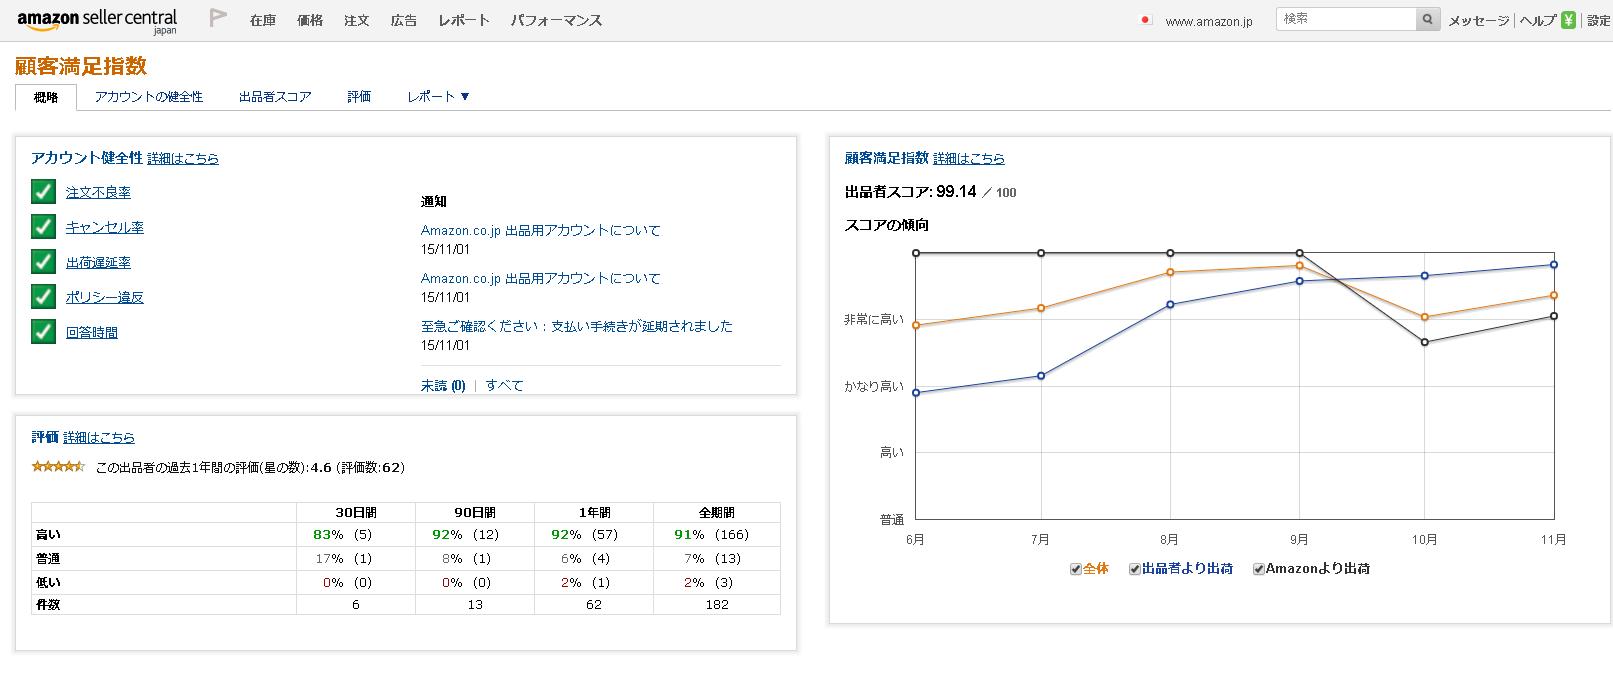 FireShot Capture 6 - 顧客満足指数 - Amazon セラーセントラル_ - https___sellercentral-japan.amazon.